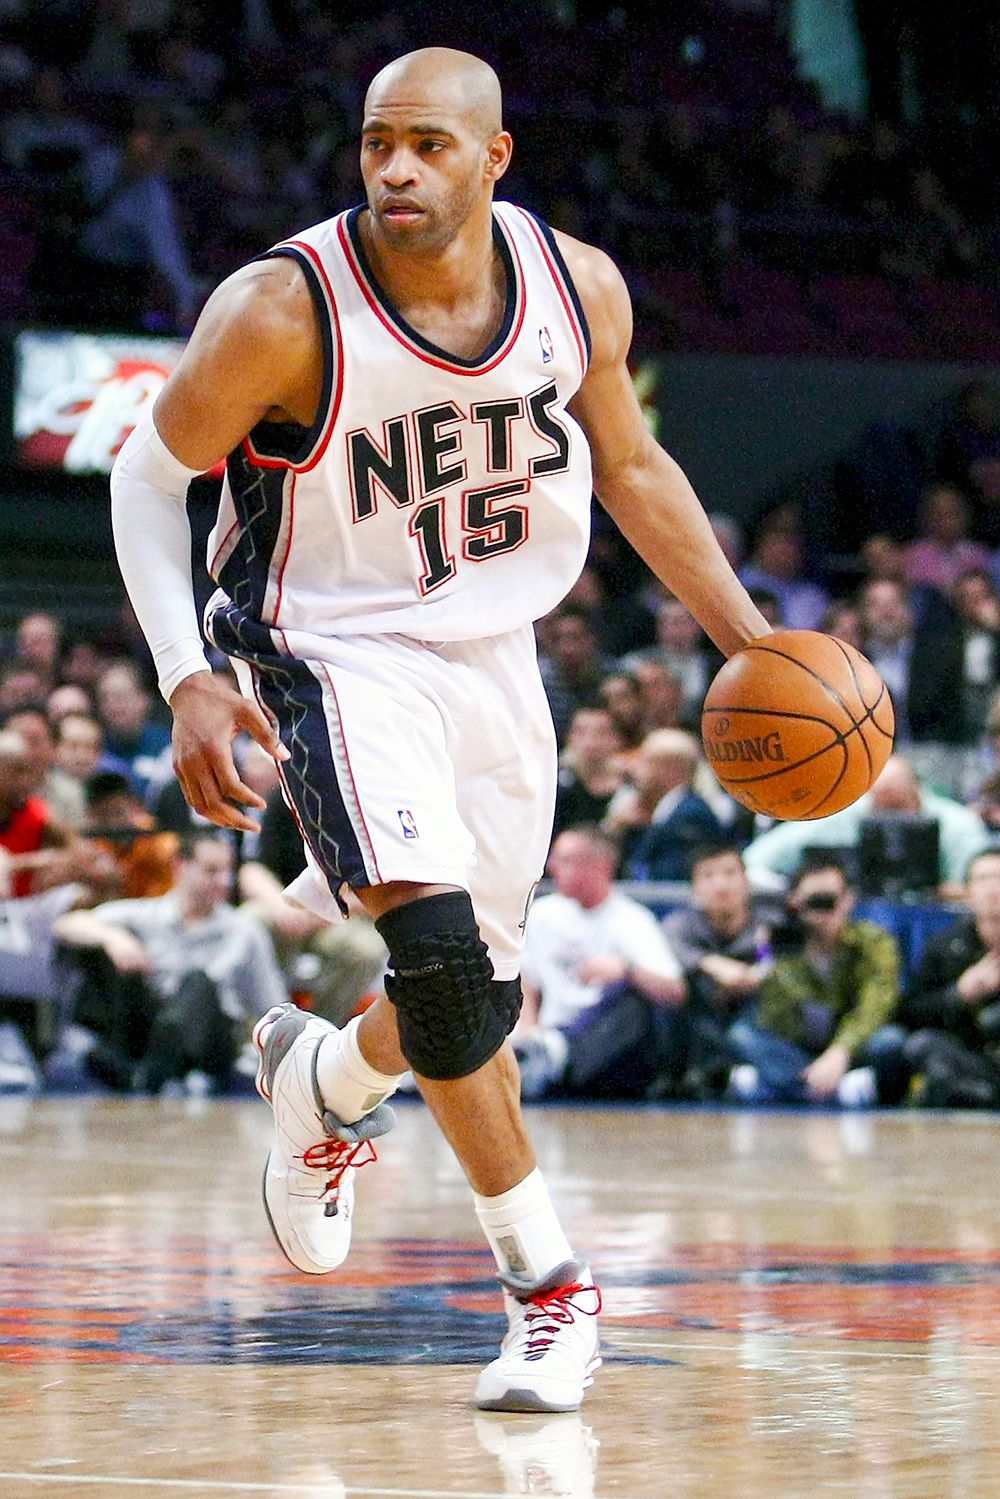 e8e06d1c884 All-time Nets   NBA players   Basketball, Nba basketball, Basketball ...